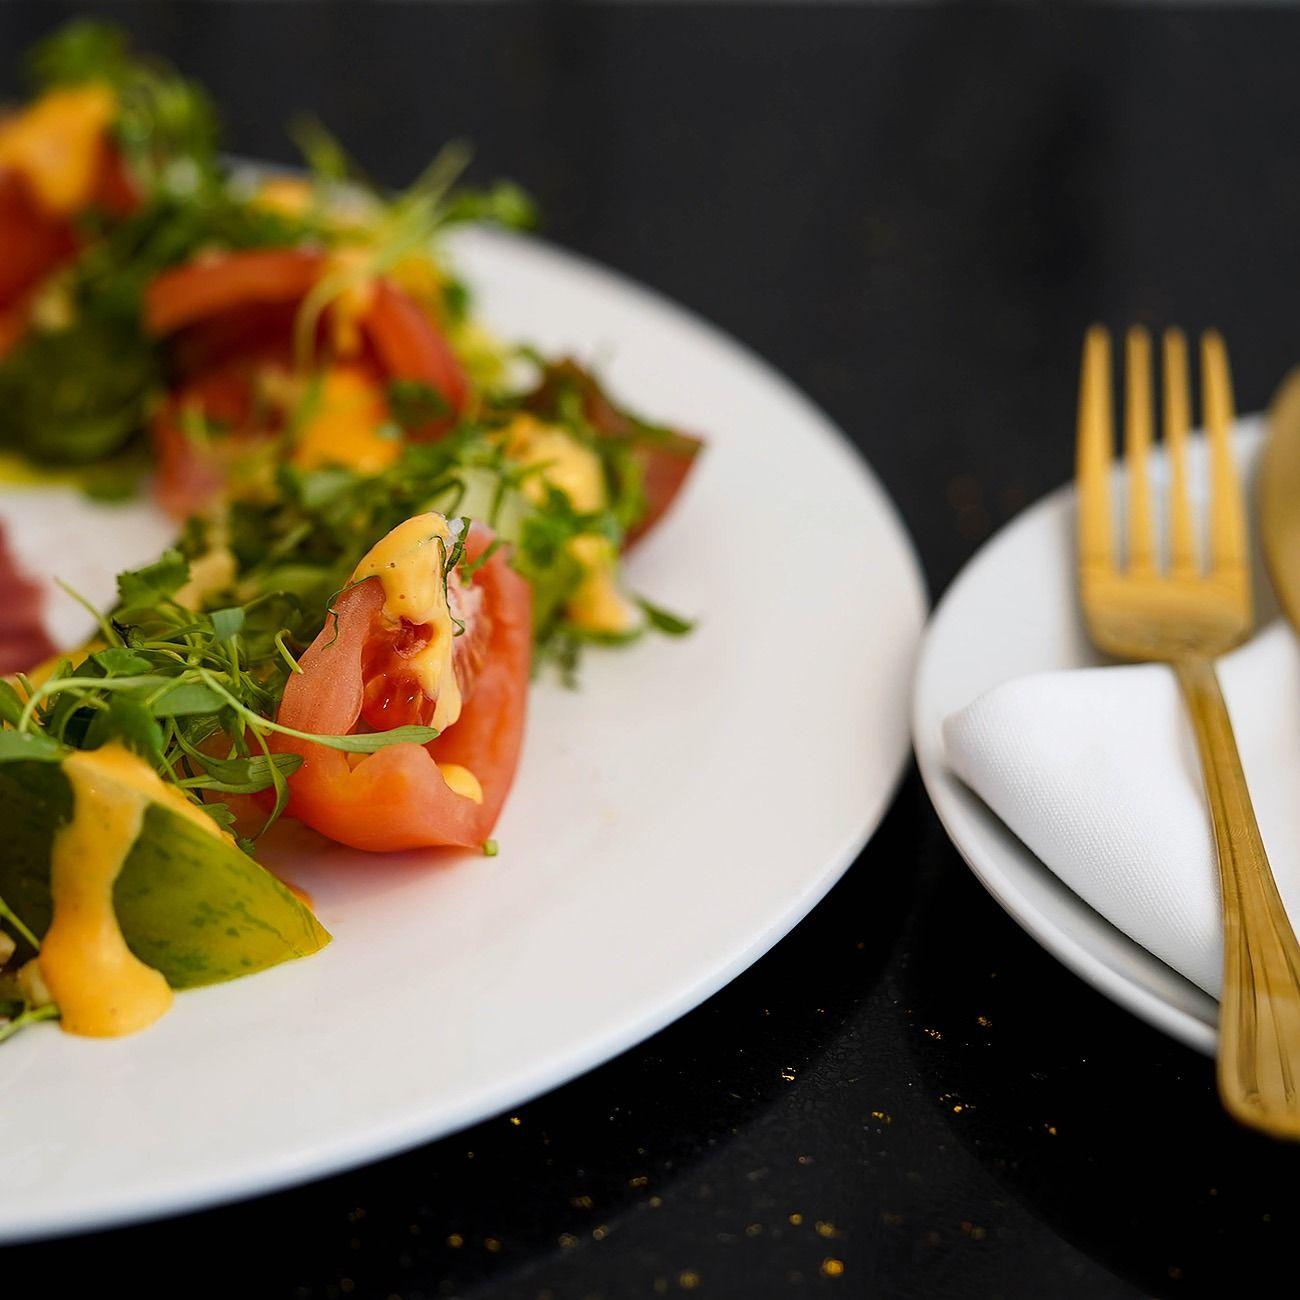 Vegan Restaurant Vegan Restaurants Food Vegetarian